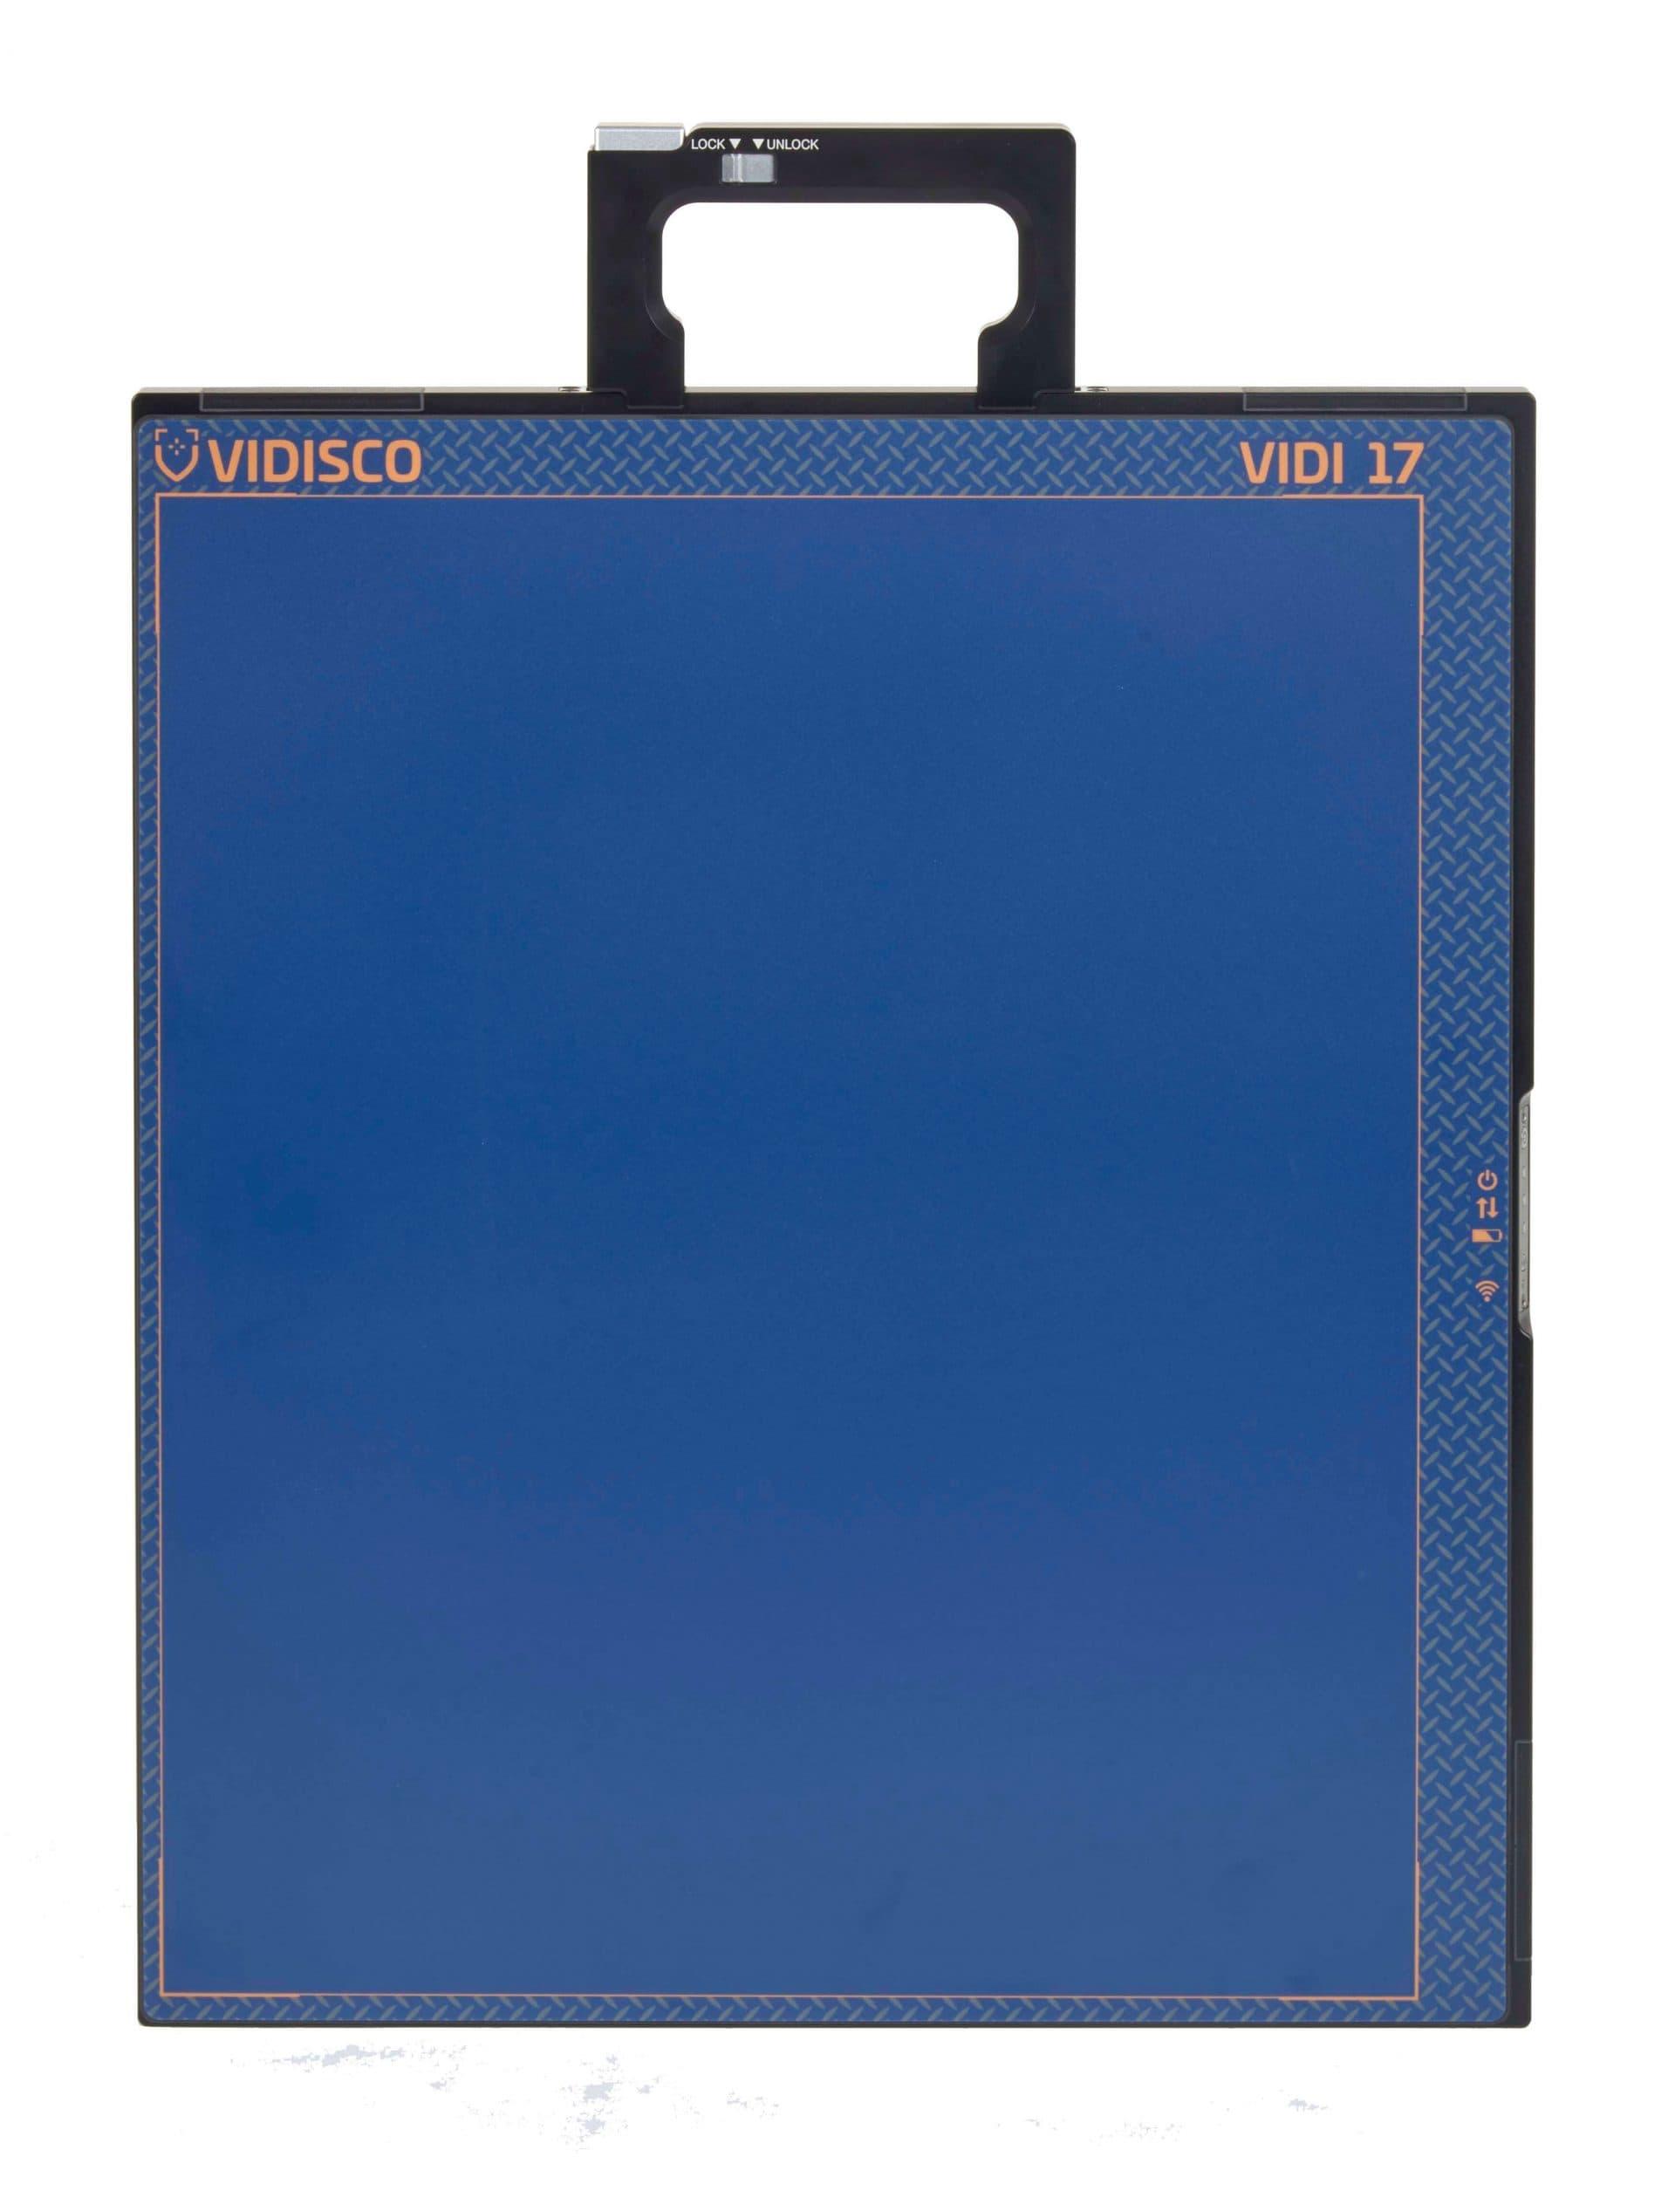 digital radiography system vidi 17